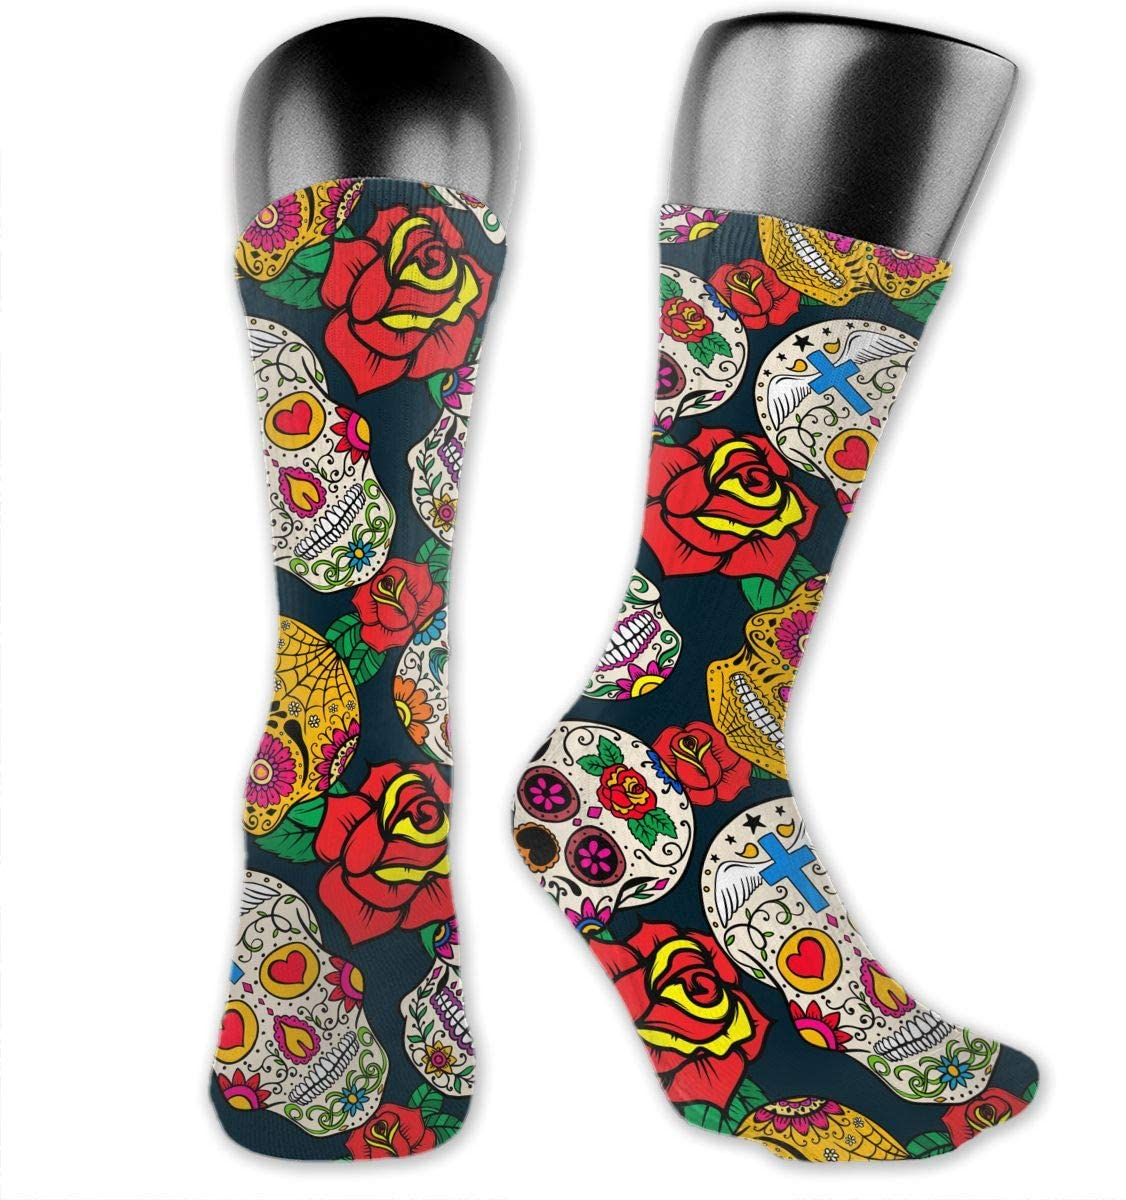 Flowers Sugar Skull Unisex Outdoor Long Socks Sport Athletic Crew Socks Stockings